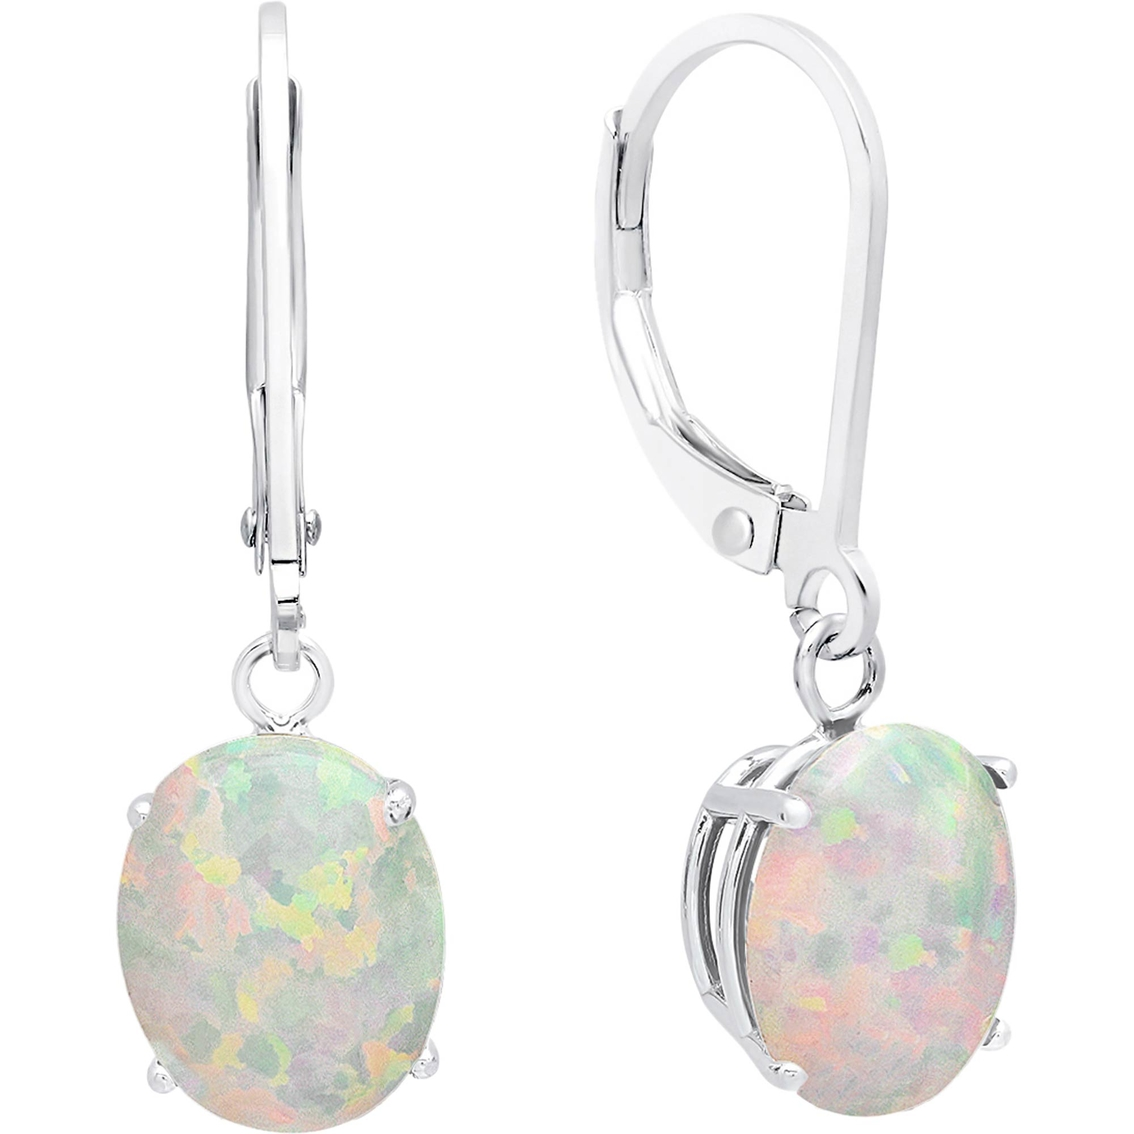 Sterling Silver Oval Created Opal Leverback Earrings